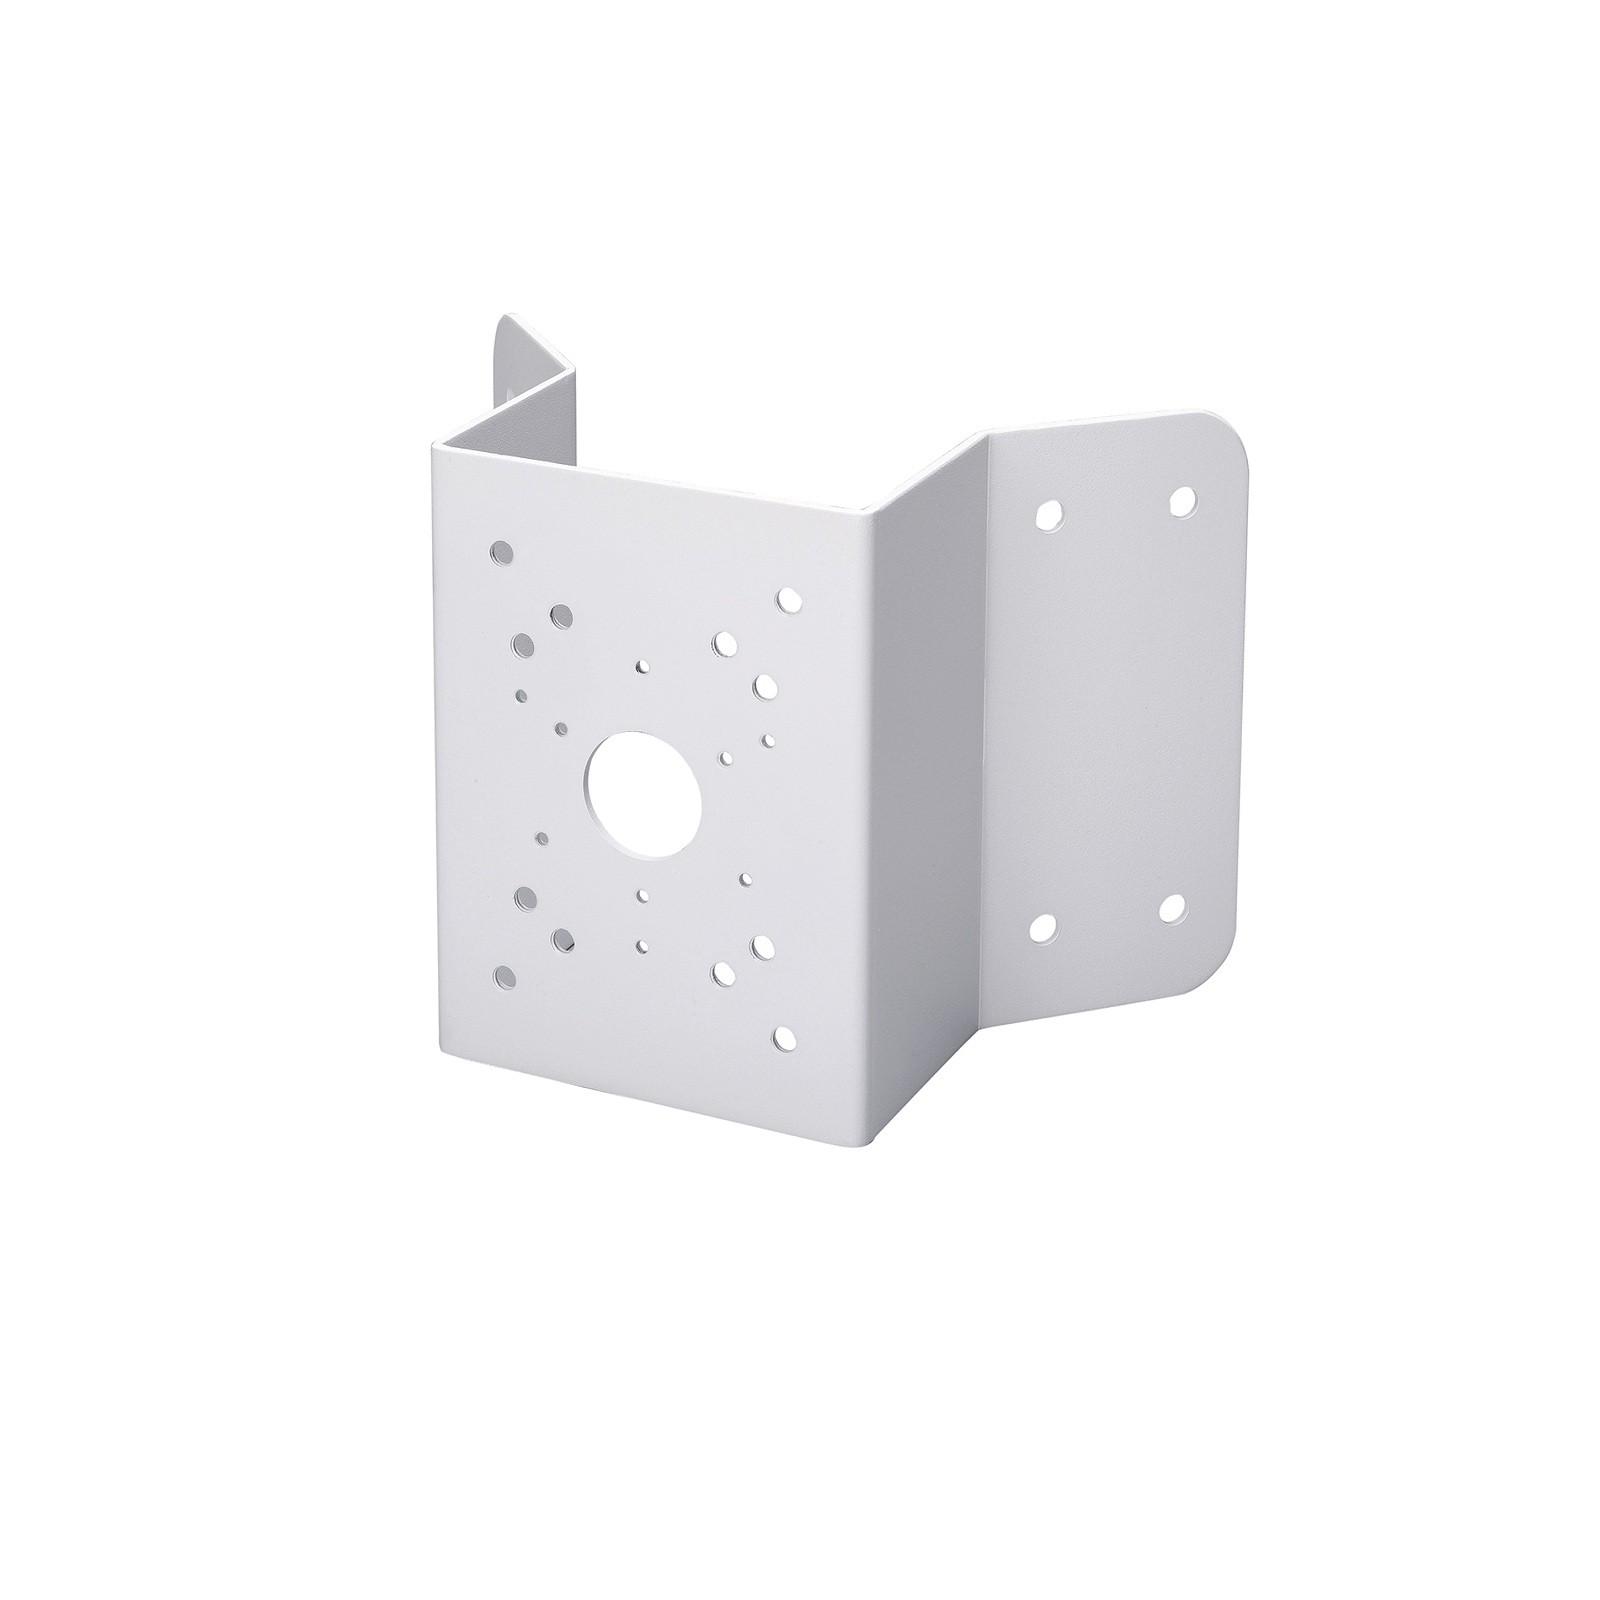 Pfa151 adaptateur angle pour cam ras dahua prix - Support mural d angle ...